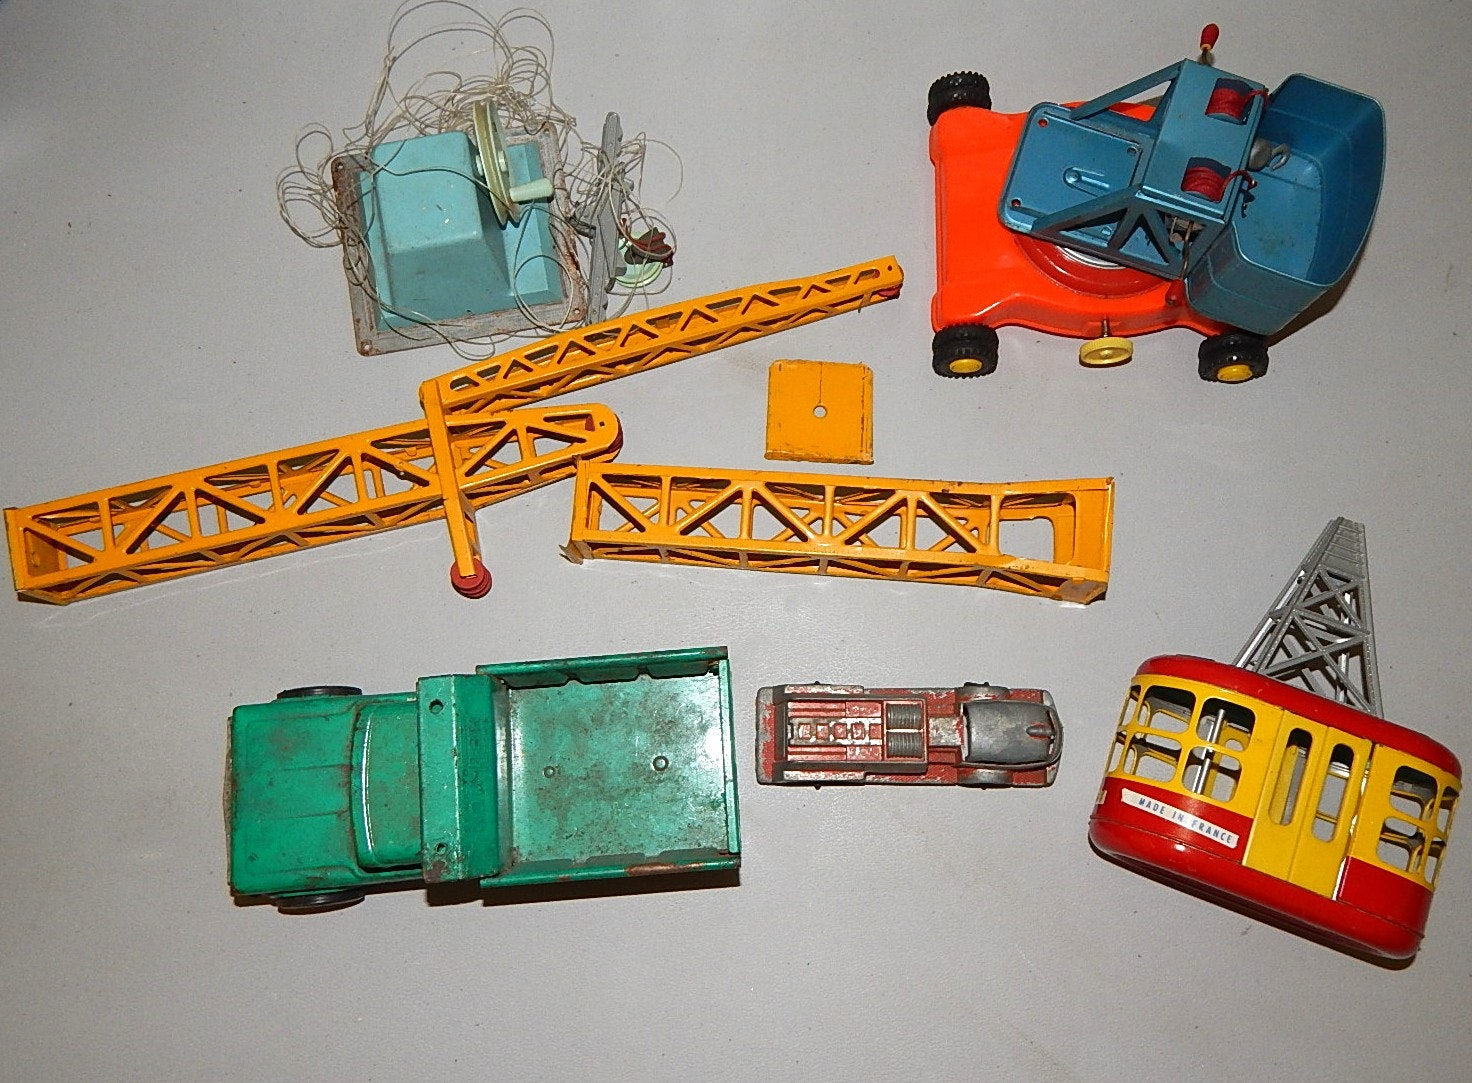 Vintage Toy Trucks Part - 45: Vintage Toy Trucks With Structo, Hubley ...